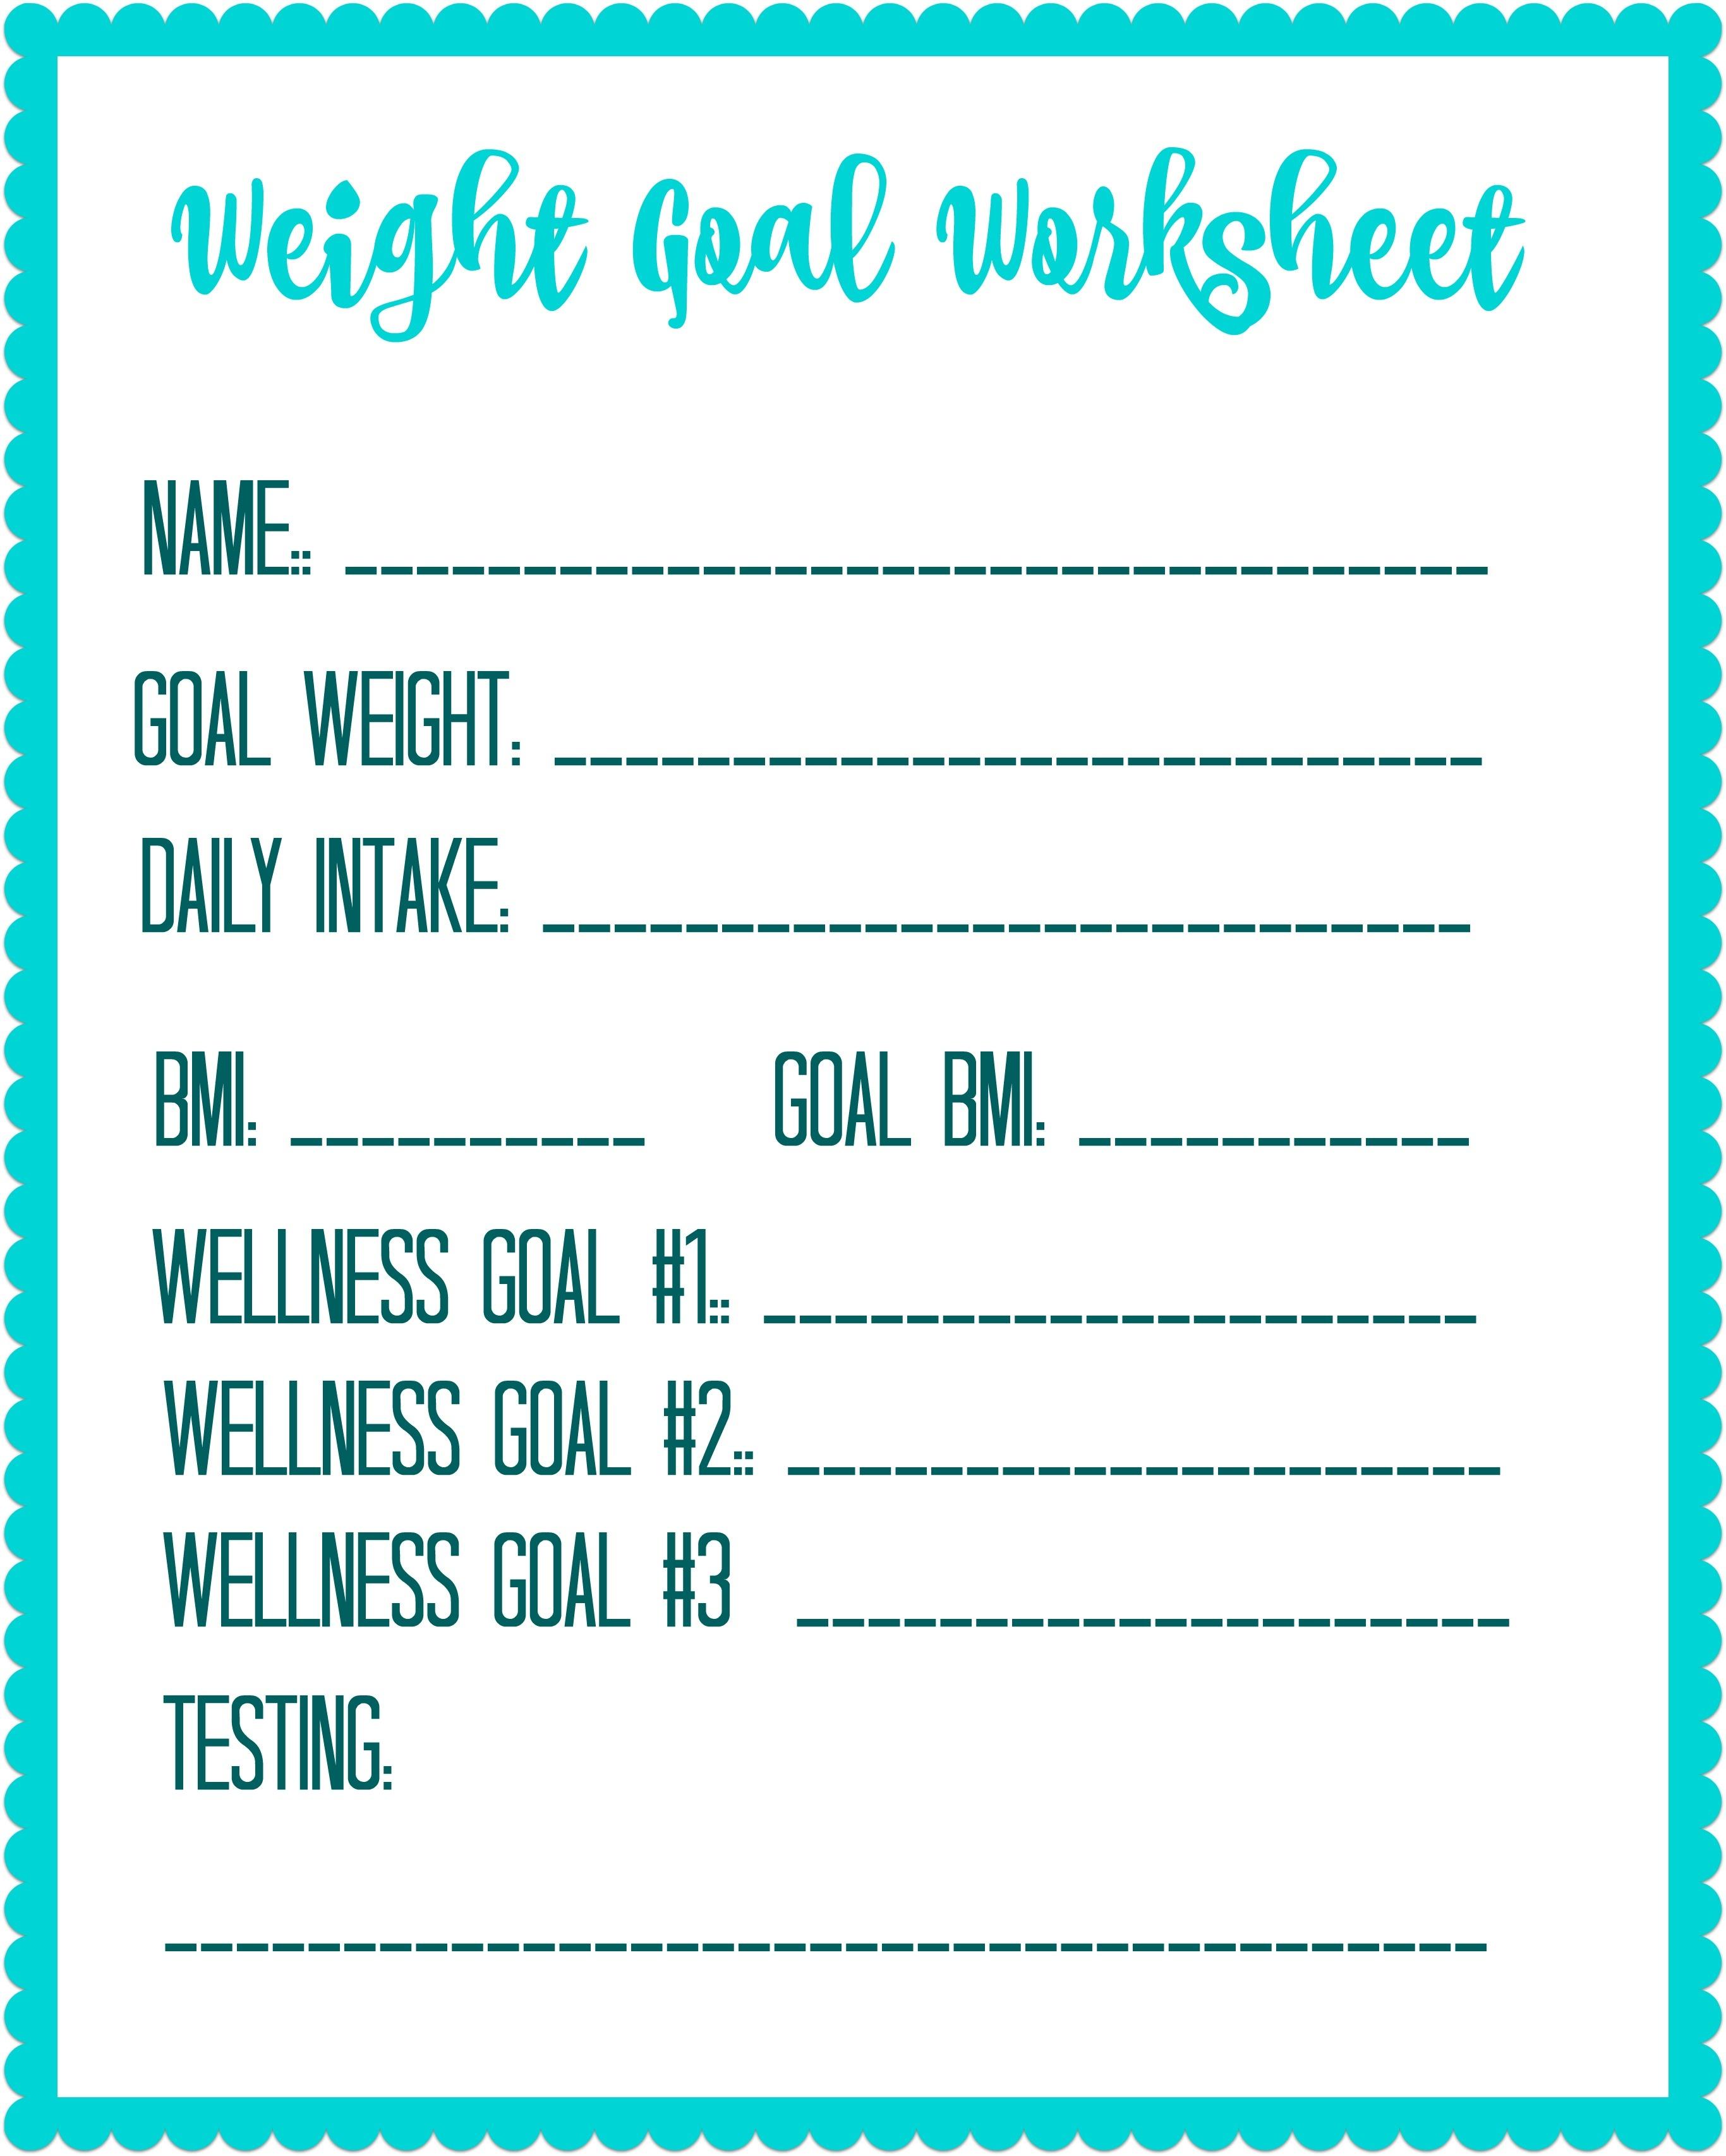 Free Printable Weight Loss Goal Worksheet - Debt Free Spending - Free Printable Calorie Counter Sheet